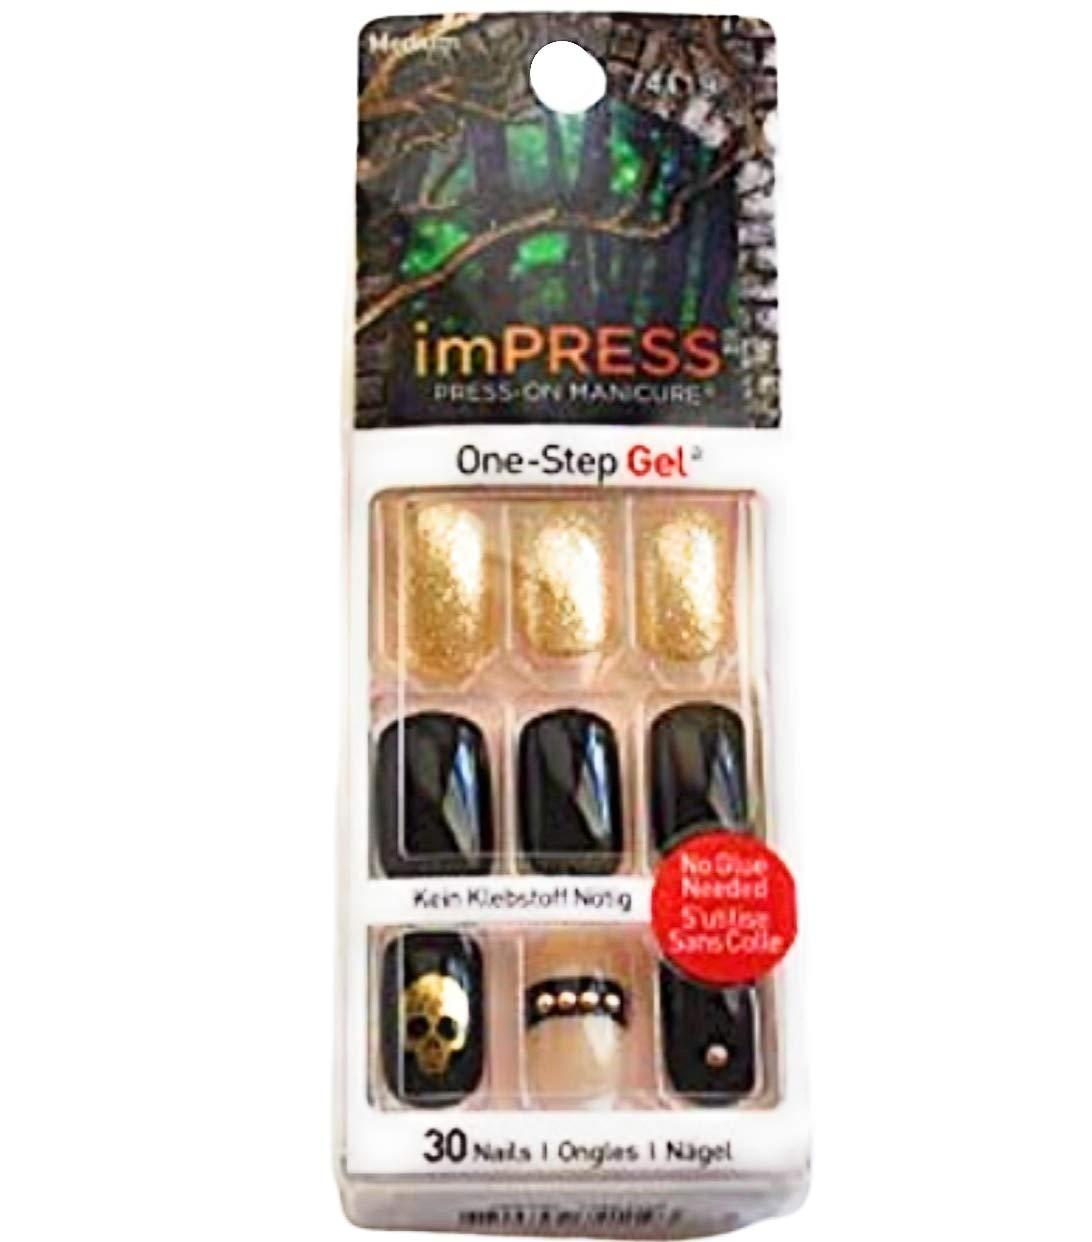 Impress Press-on Manicure Halloween Edition Medium Length, Square Shape Nails - Rouge by Impress